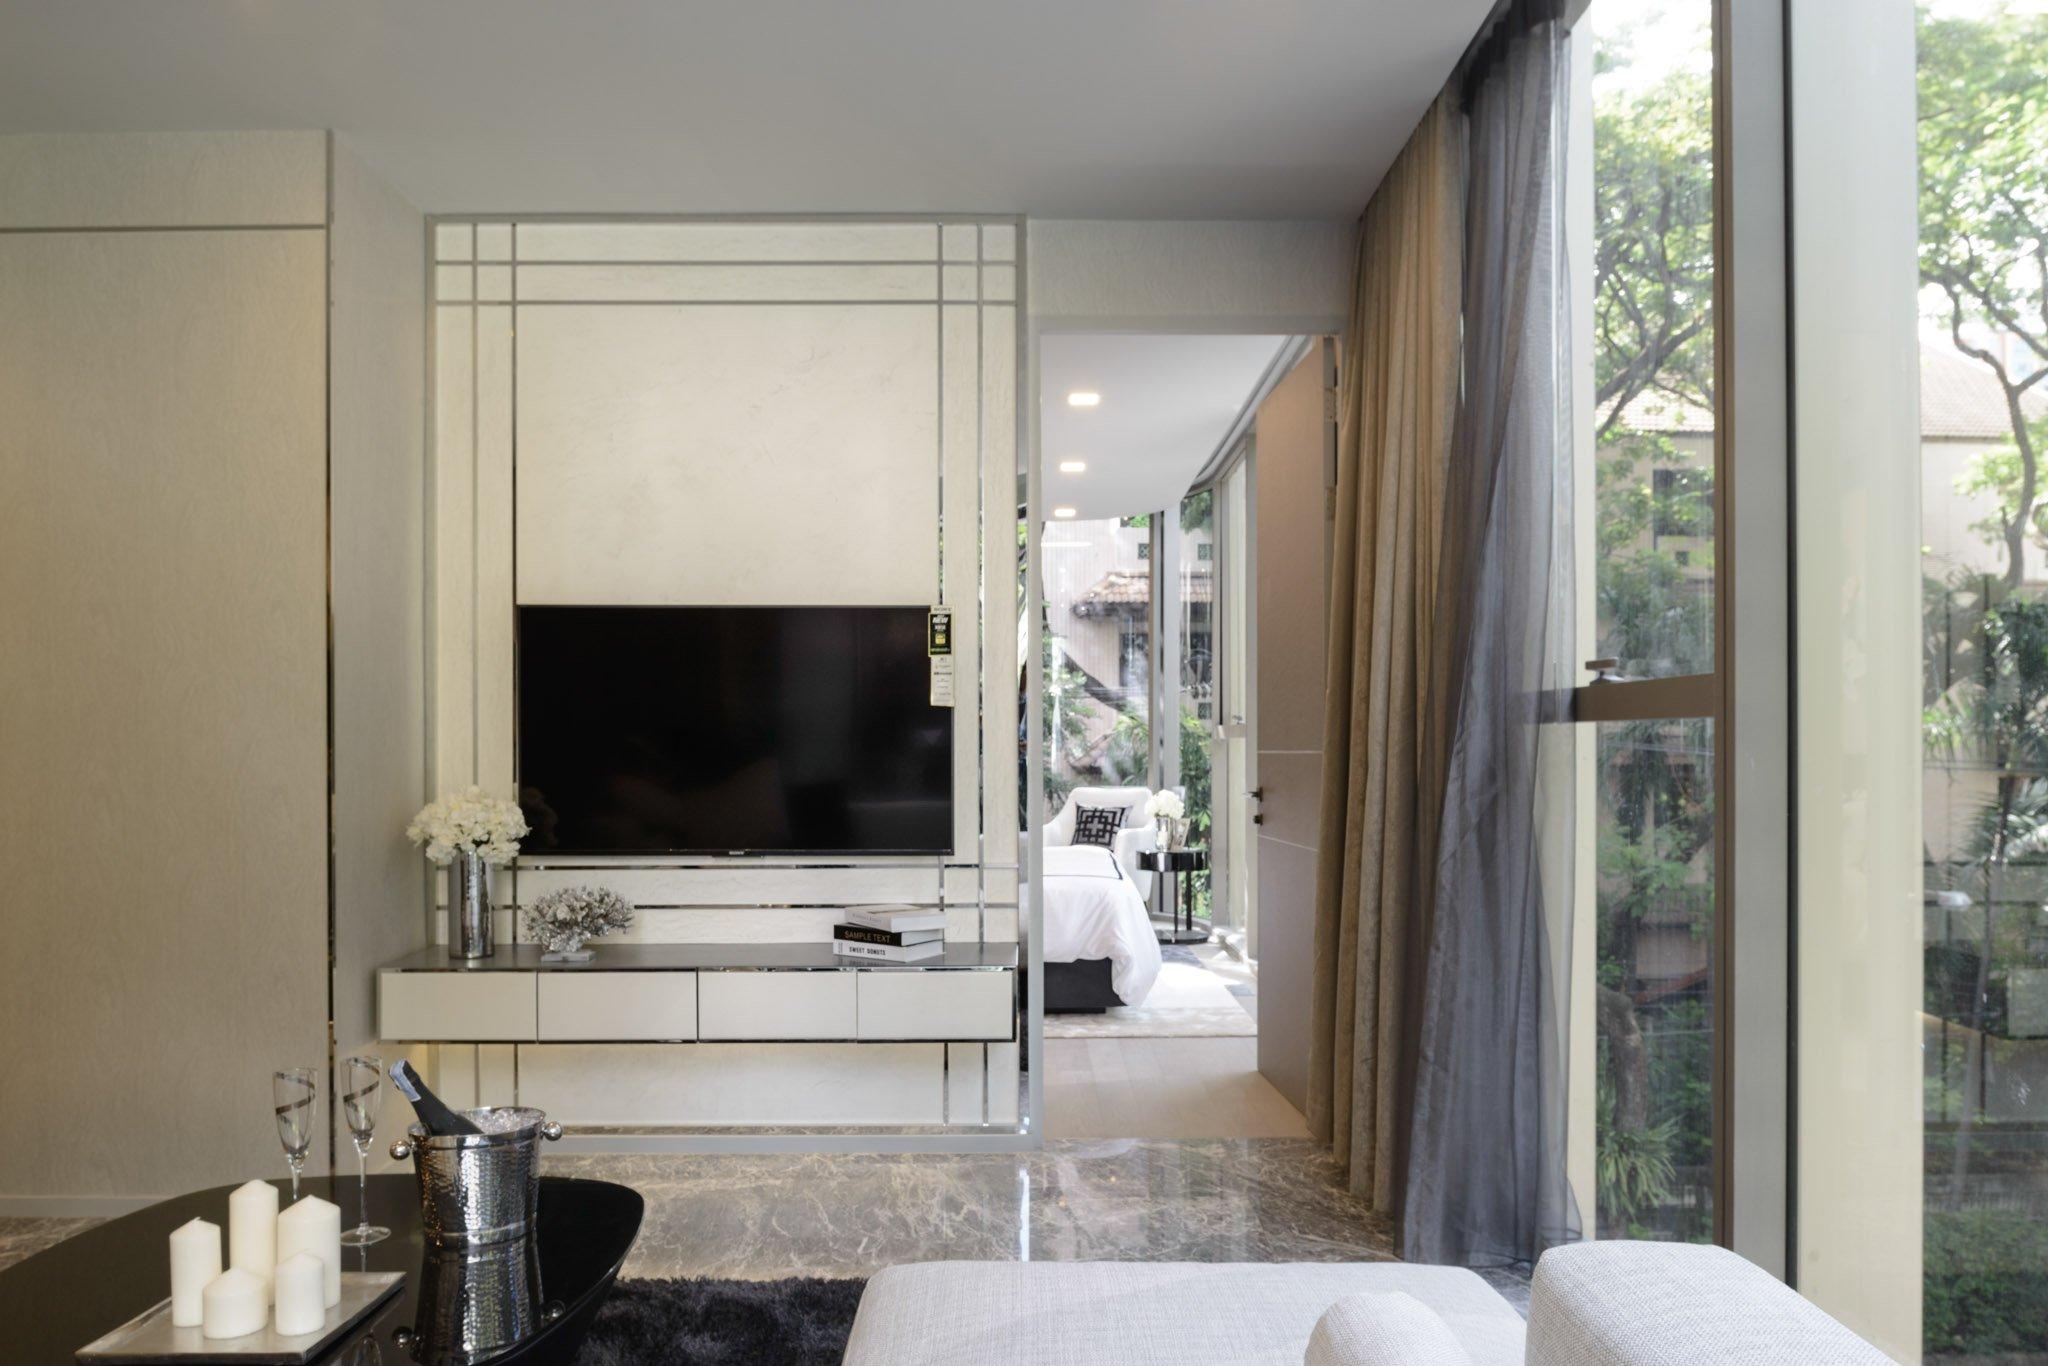 ASHTON Residence 41 Yours. For Keeps. 31 - Ananda Development (อนันดา ดีเวลลอปเม้นท์)